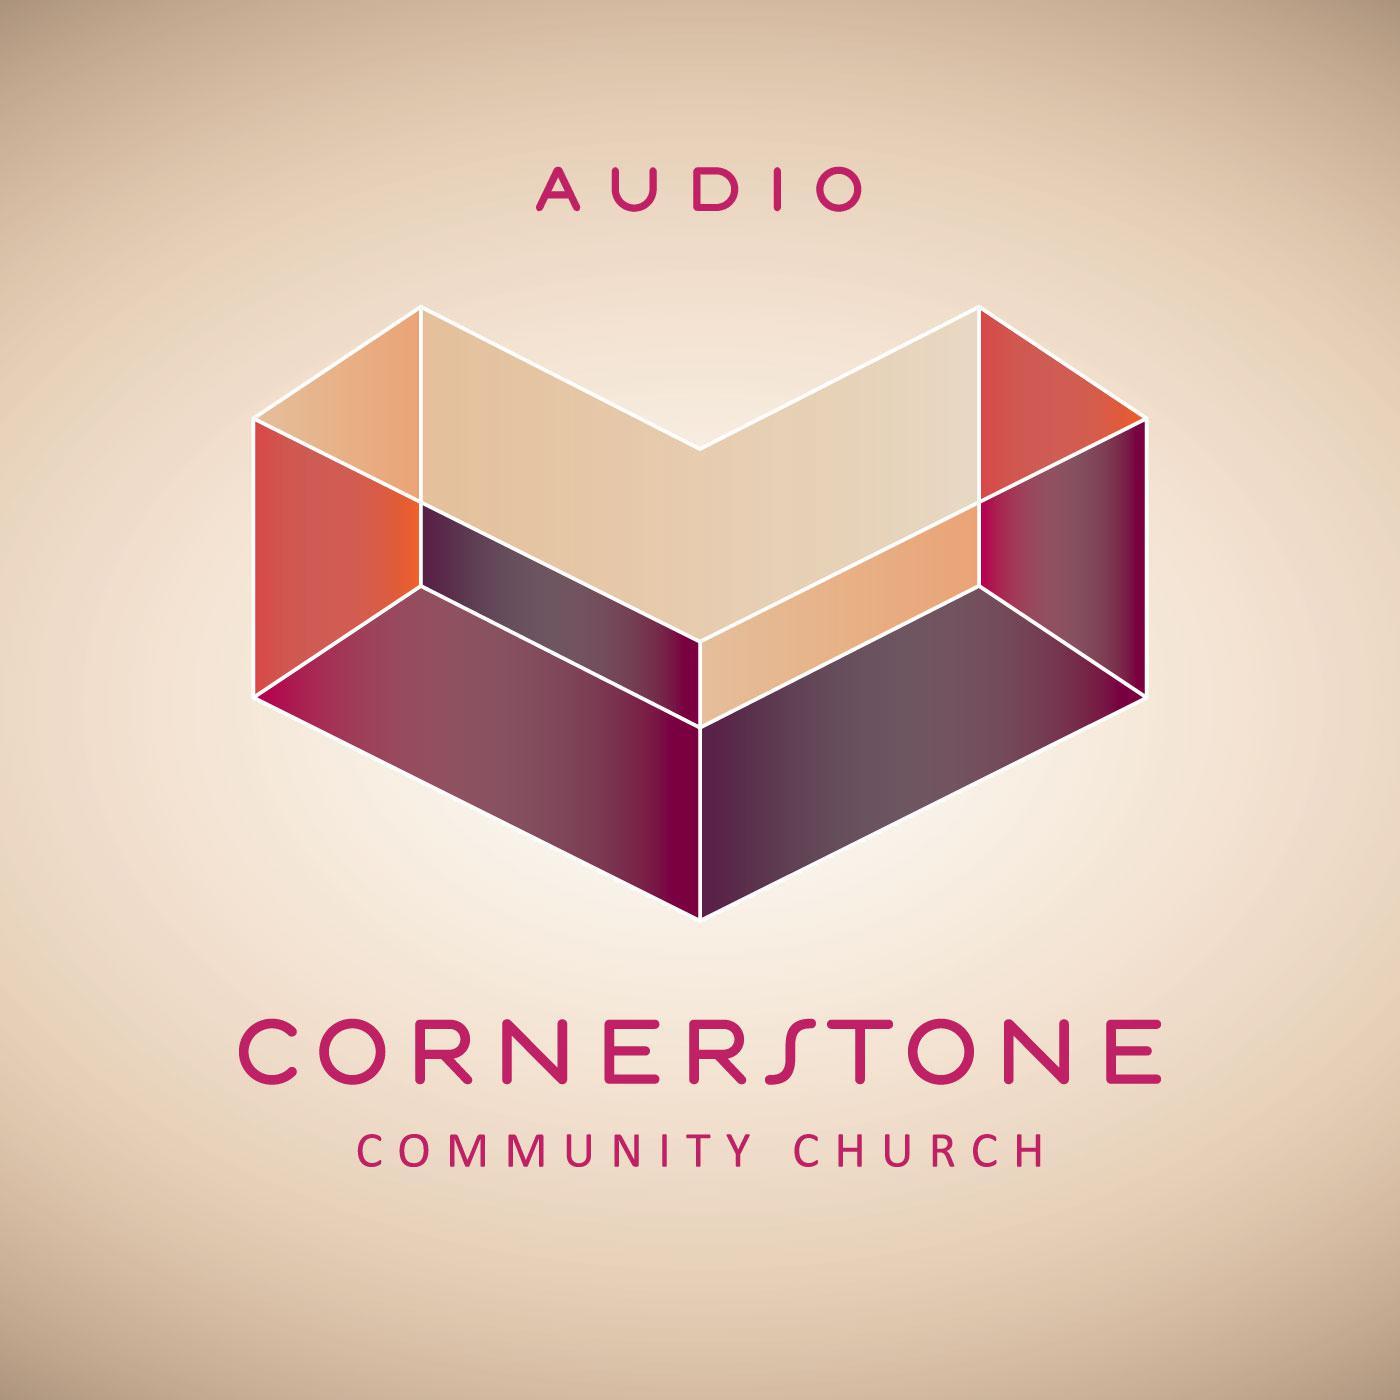 Cornerstone Singapore Audio Podcast - Cornerstone Community Church